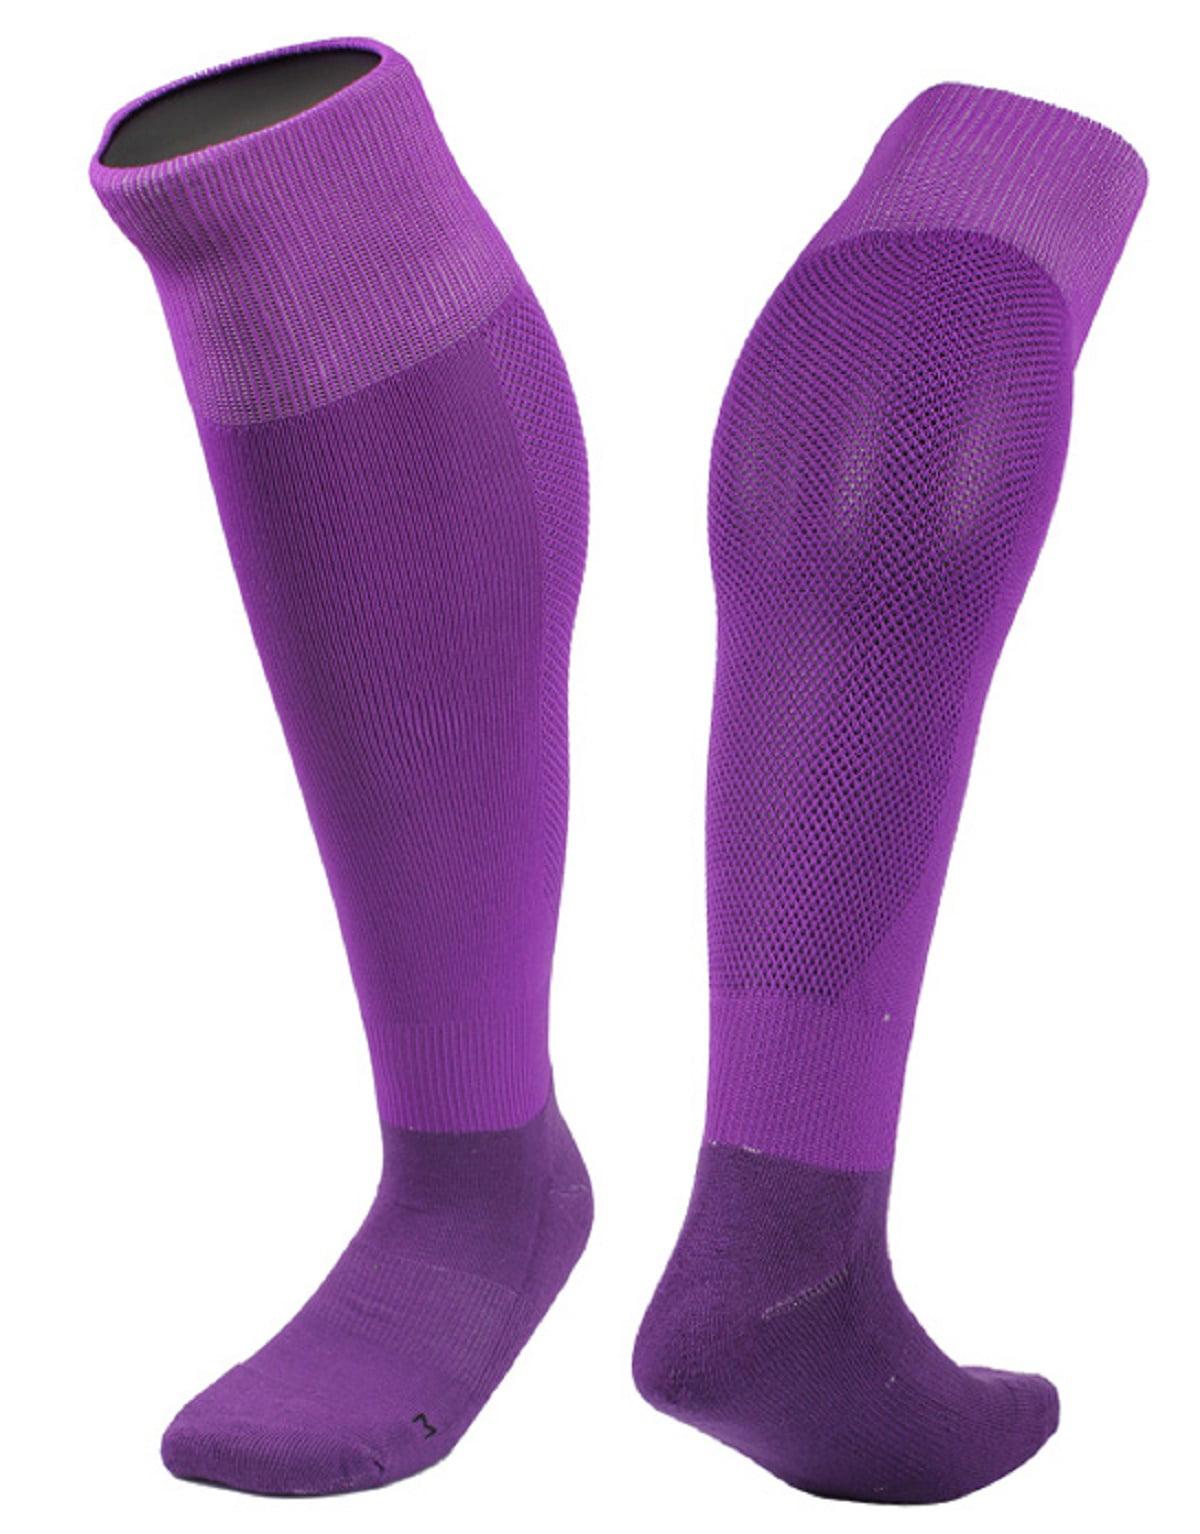 Lovely Annie Women's 2 Pairs Knee High Sports Socks for Baseball/Soccer/Lacrosse 005 M(Yellow)